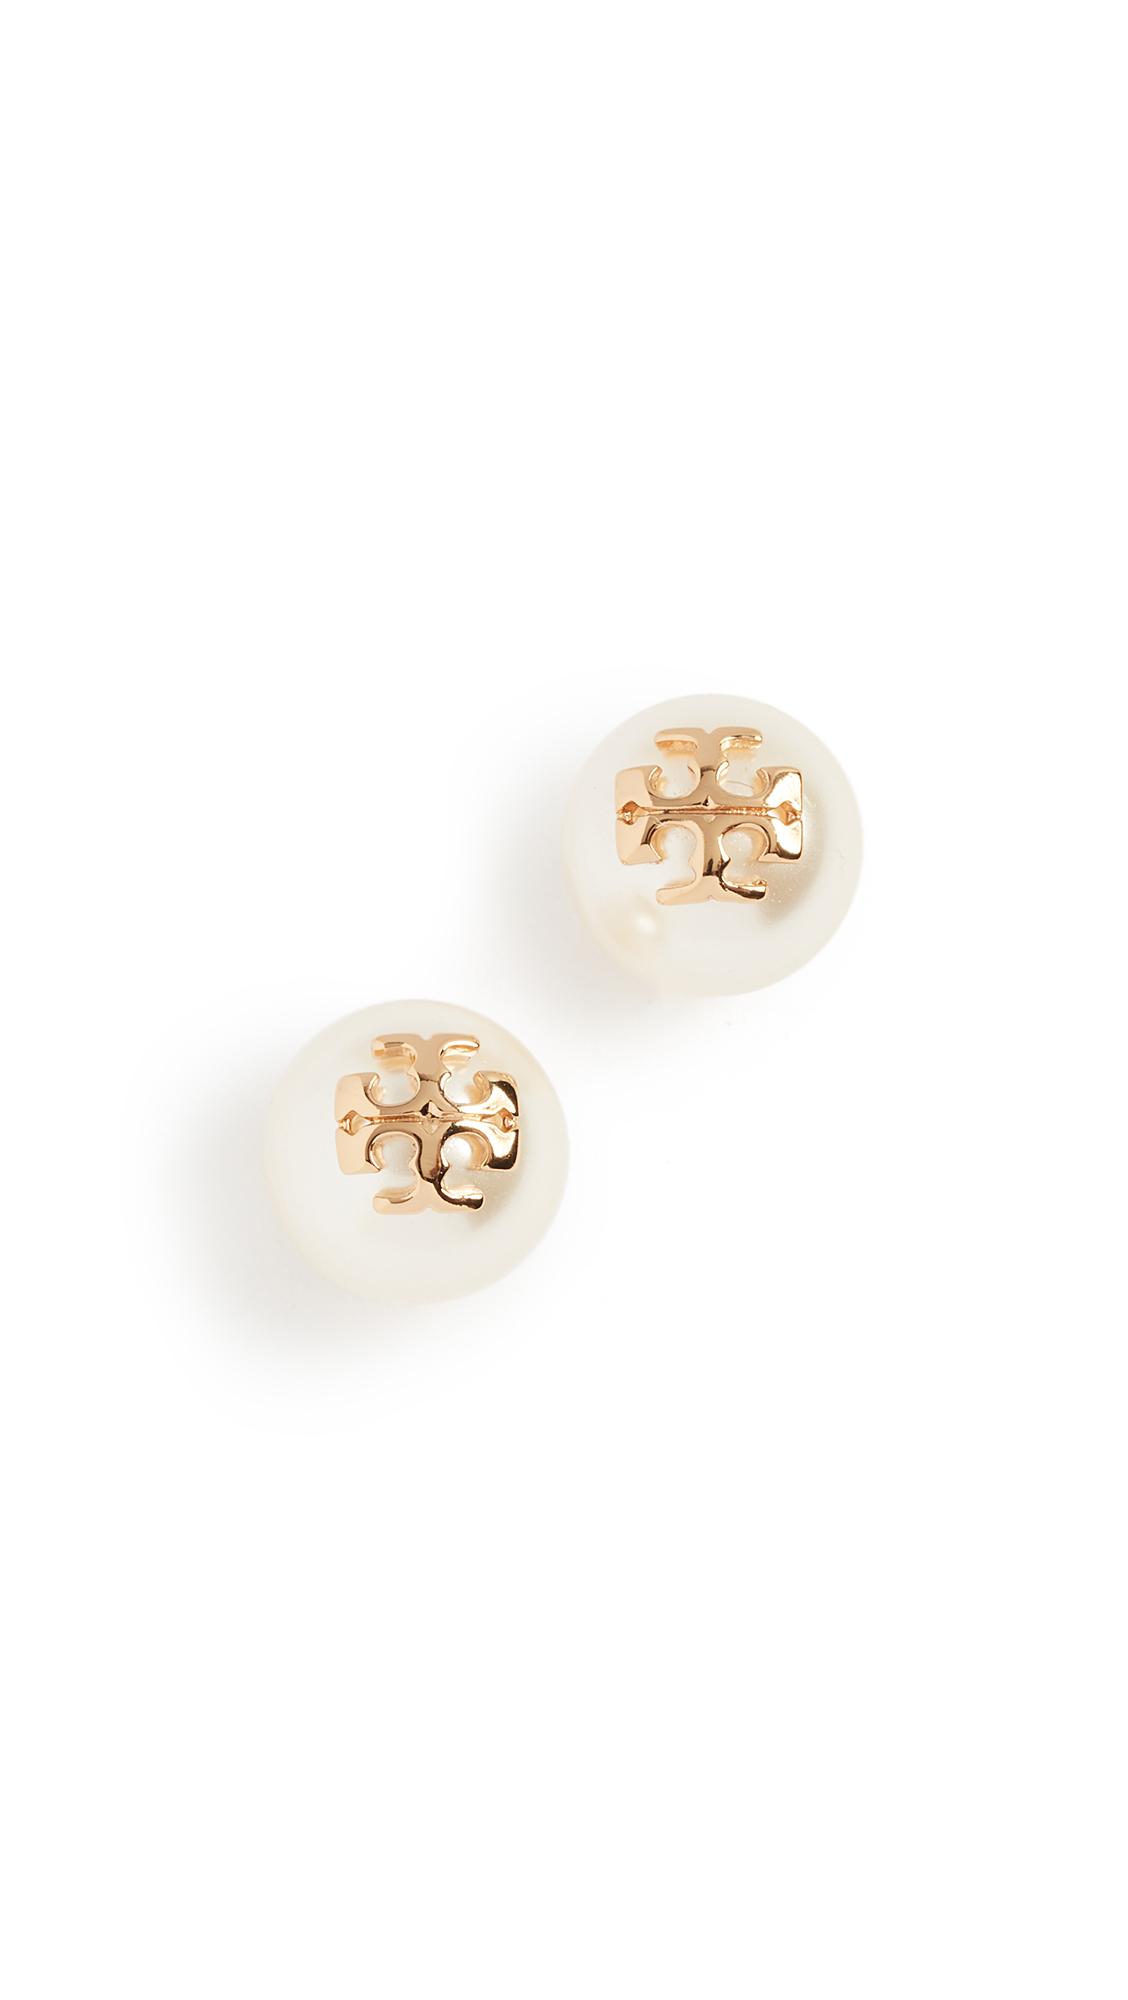 Tory Burch Swarovski Imitation Pearl Stud Earrings - Ivory/Shiny Gold